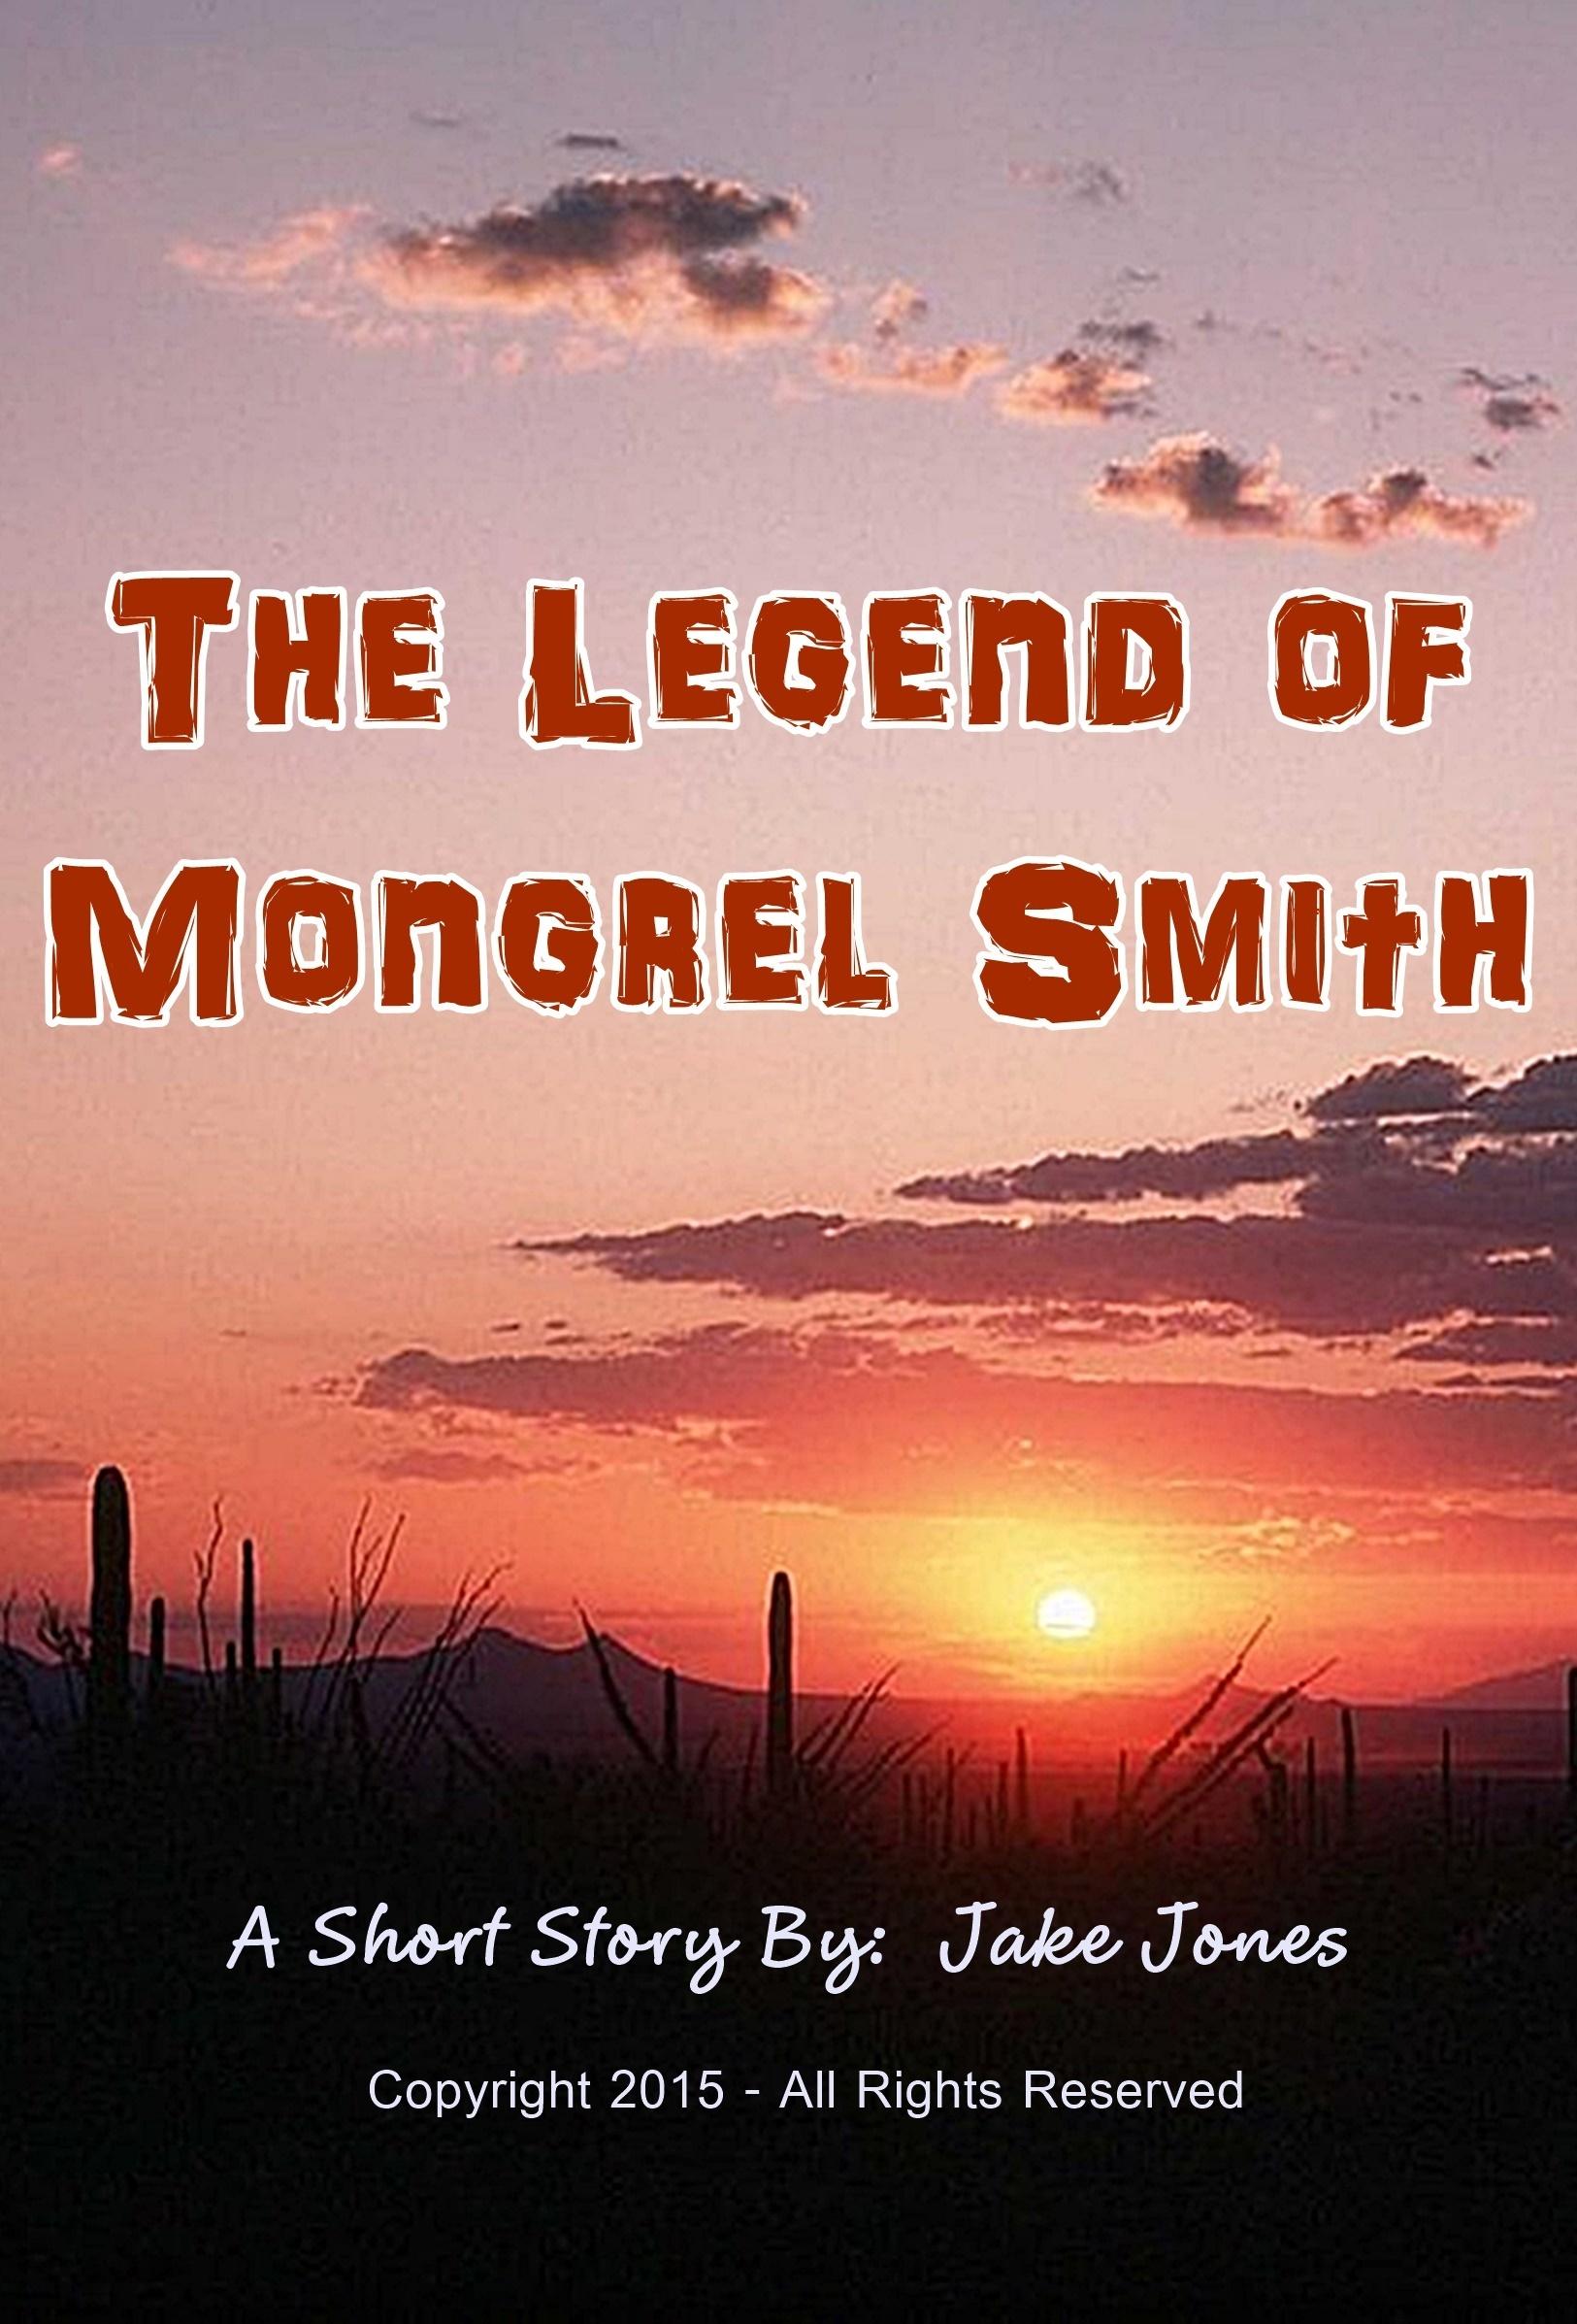 The Legend of Mongrel Smith Jake Jones